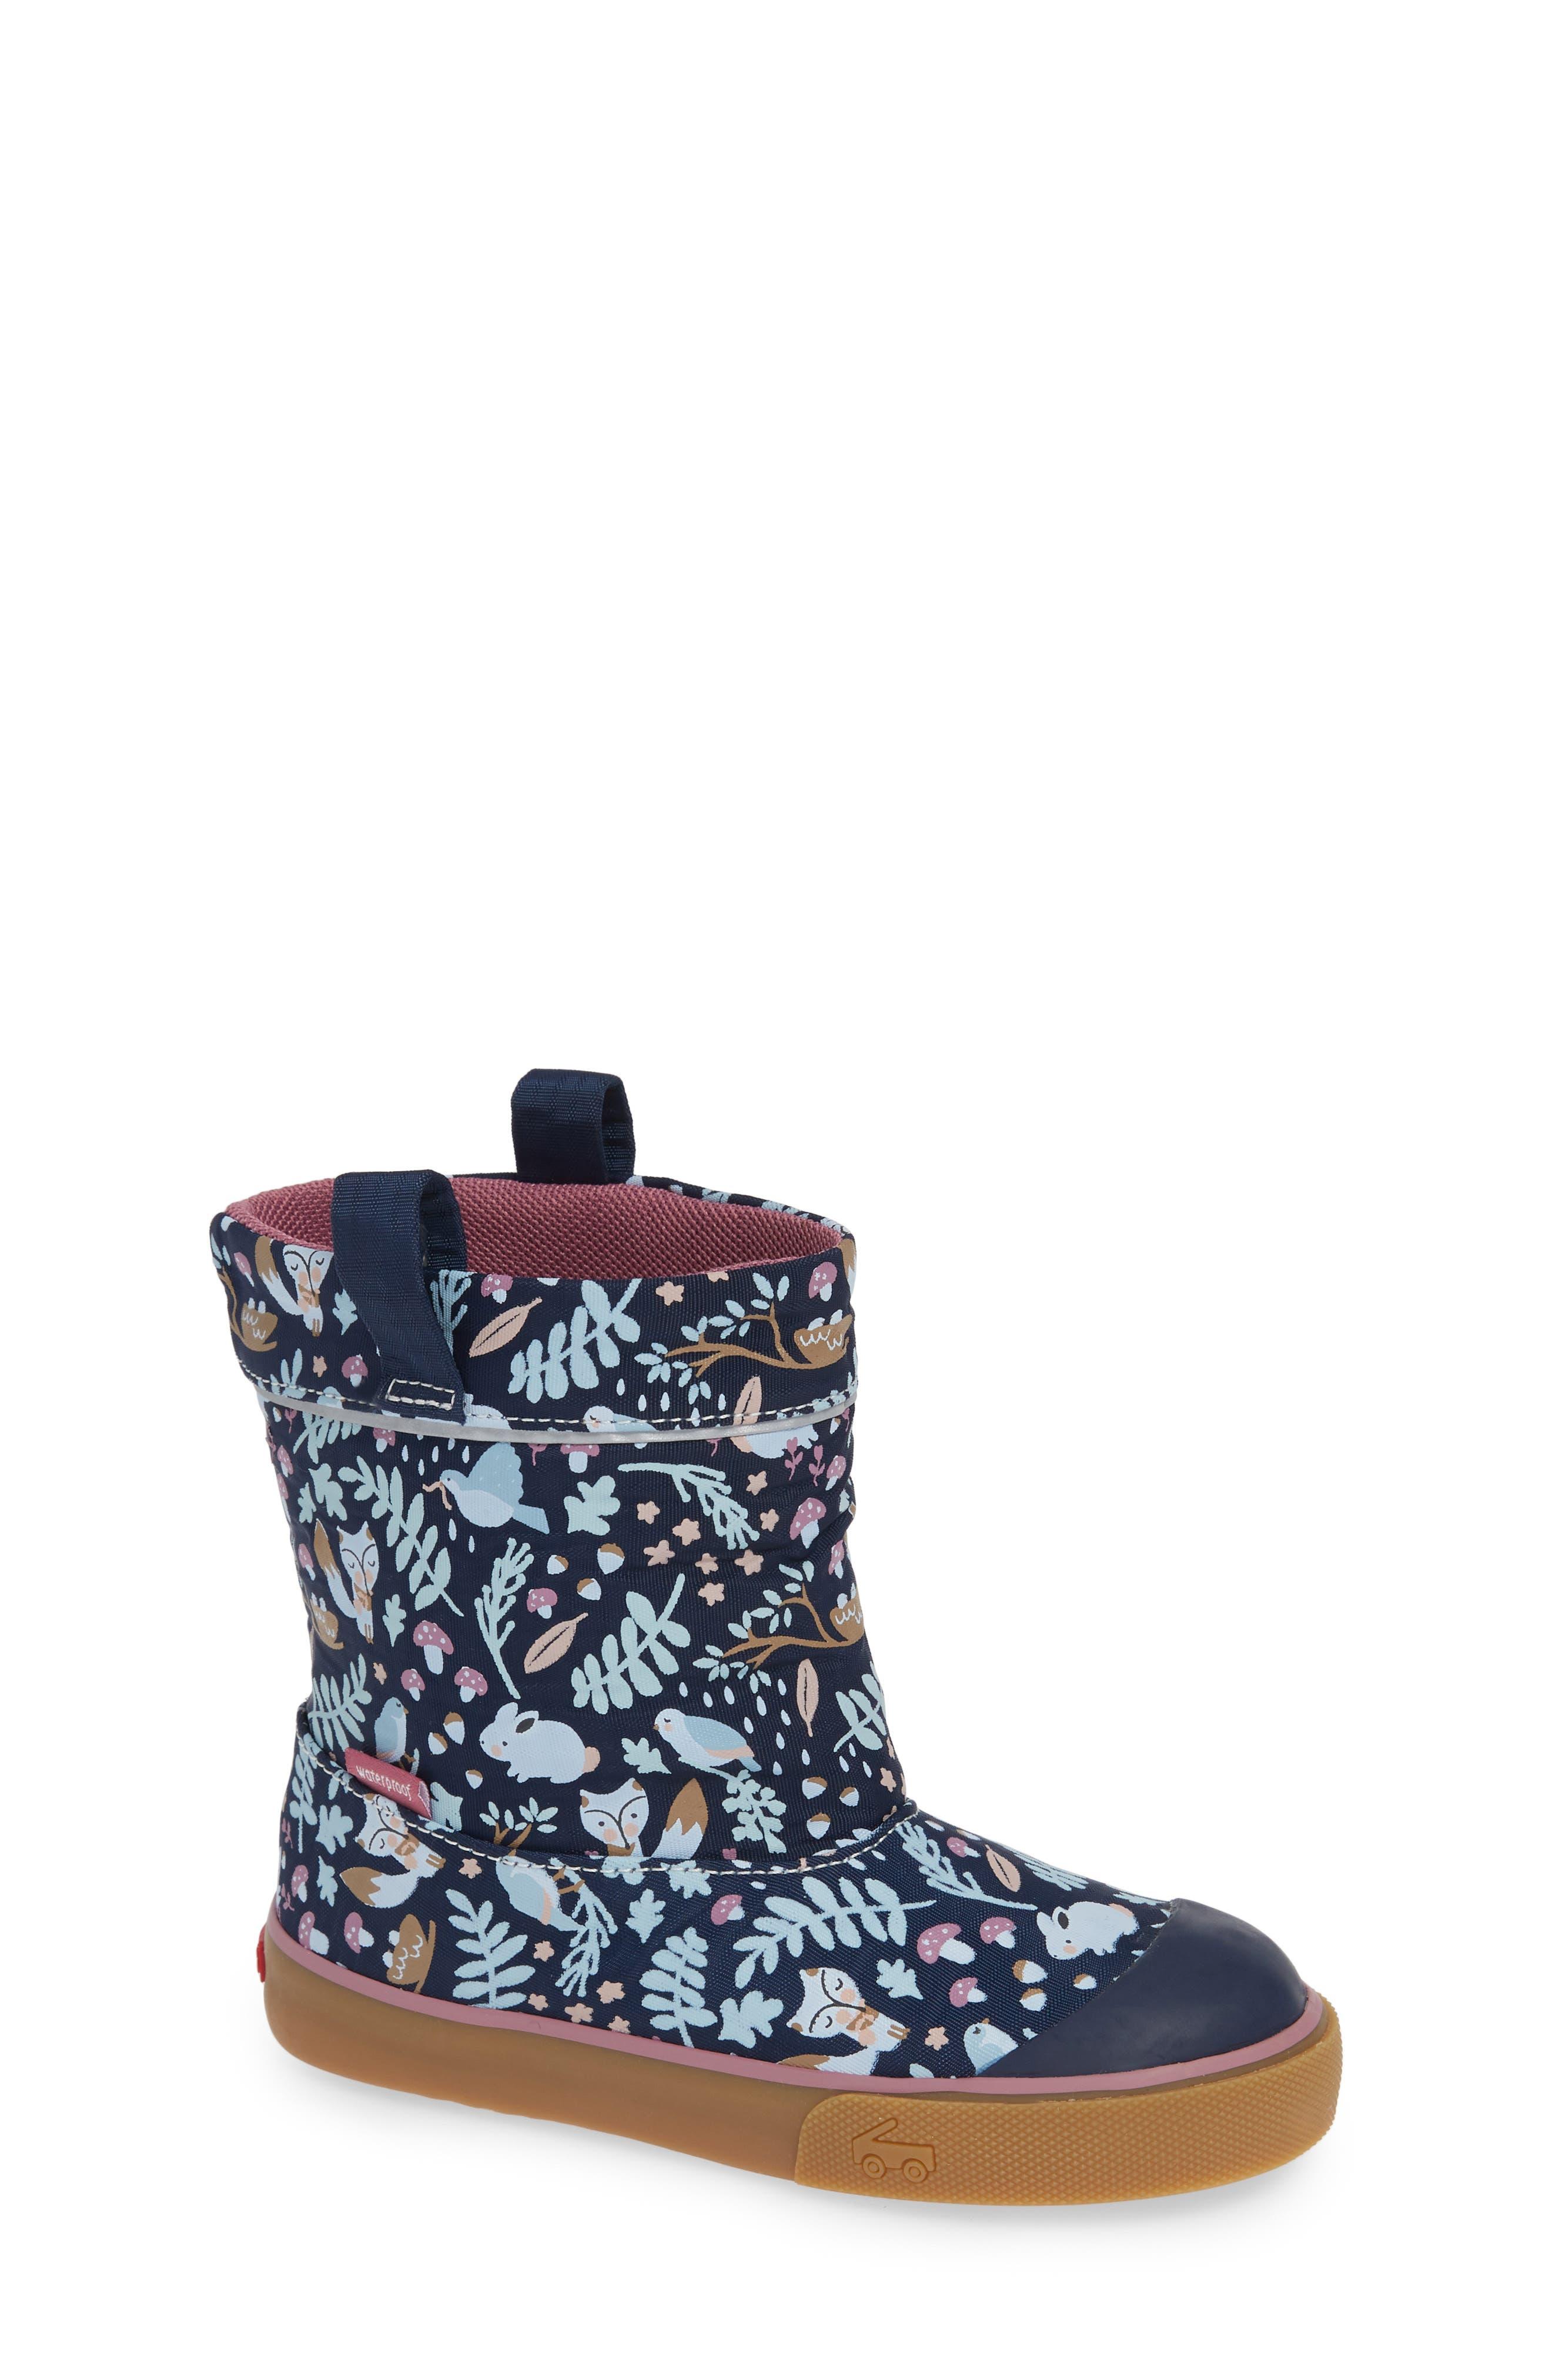 Montlake Waterproof Boot,                             Main thumbnail 1, color,                             NAVY WOODLAND